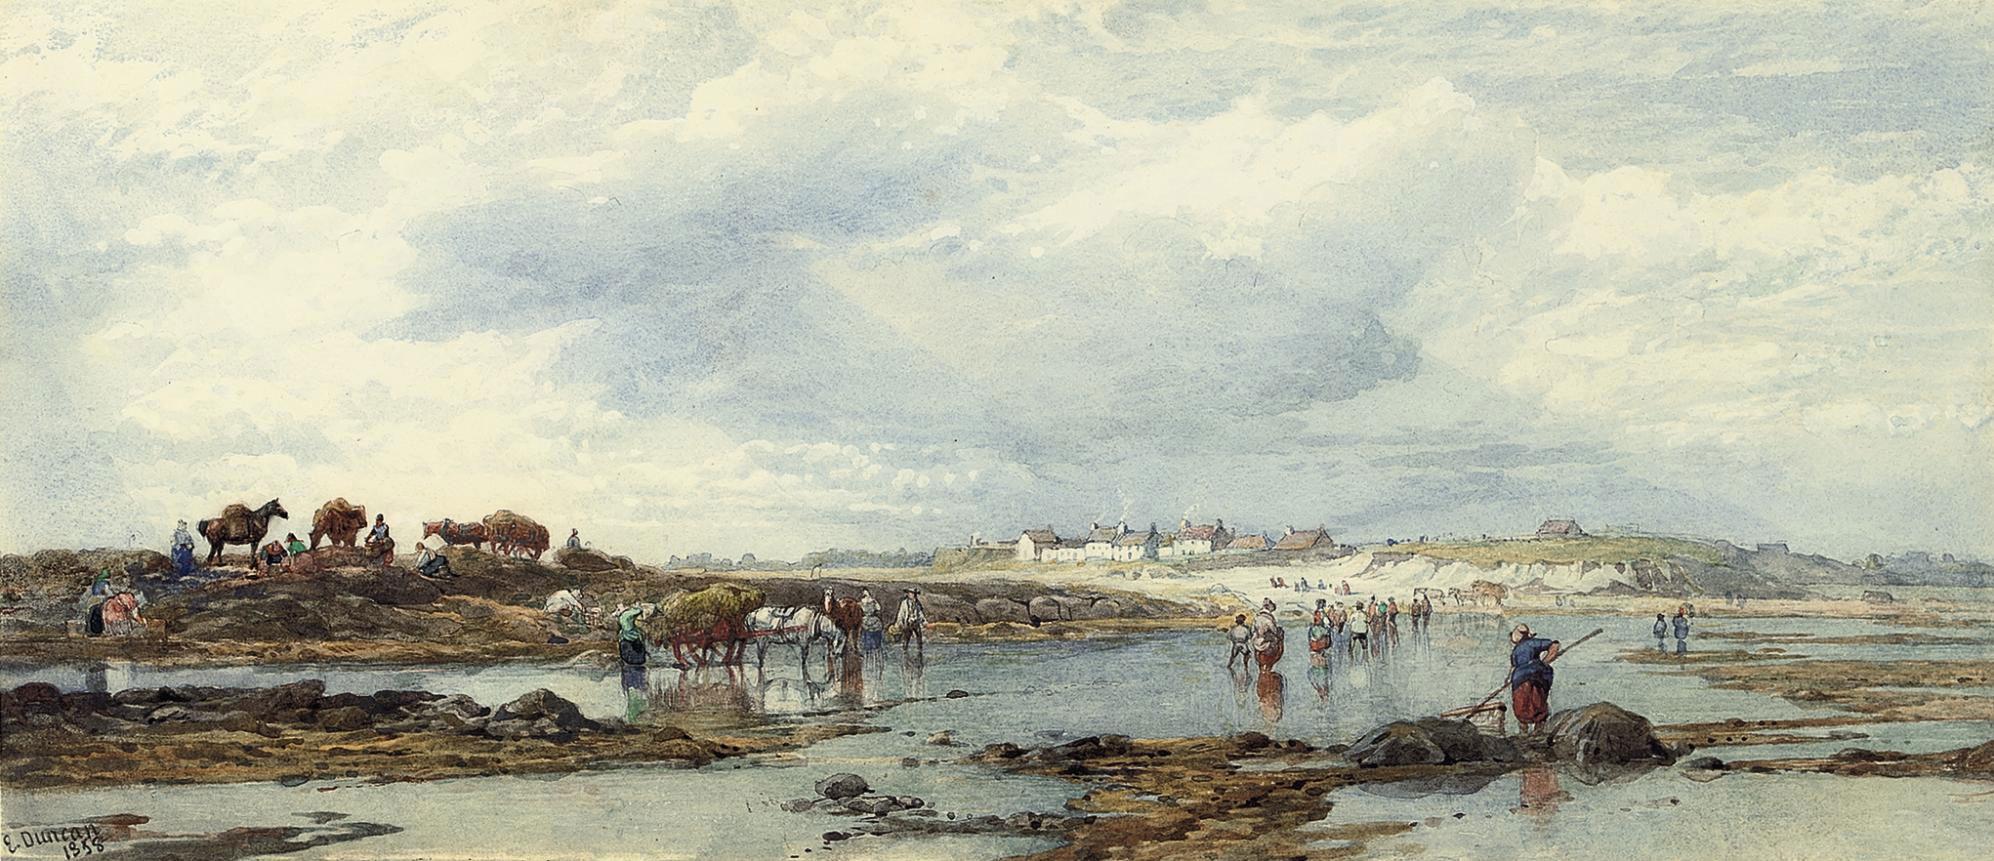 Vraic gathering, Guernsey